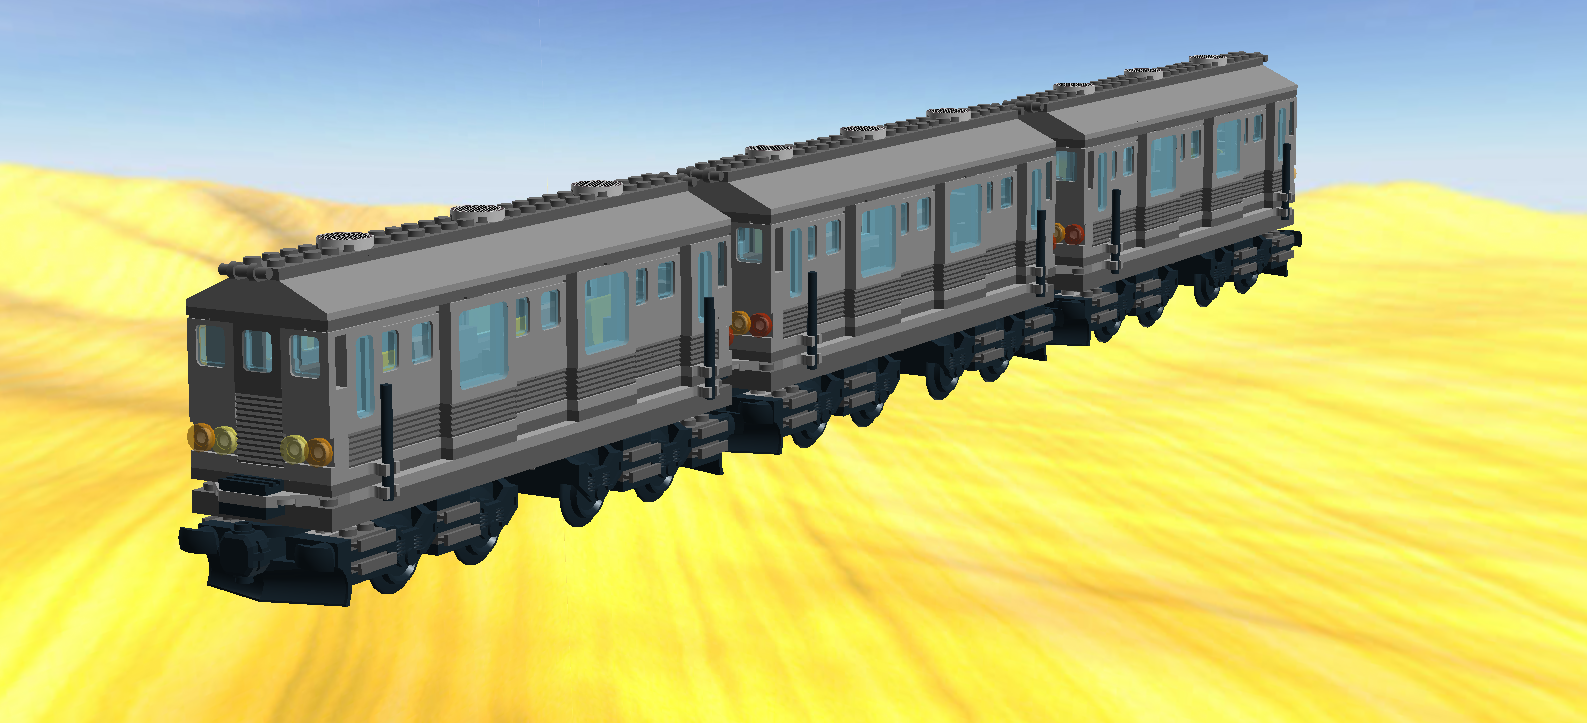 Lego Ideas Product Ideas Lego City Subway Express